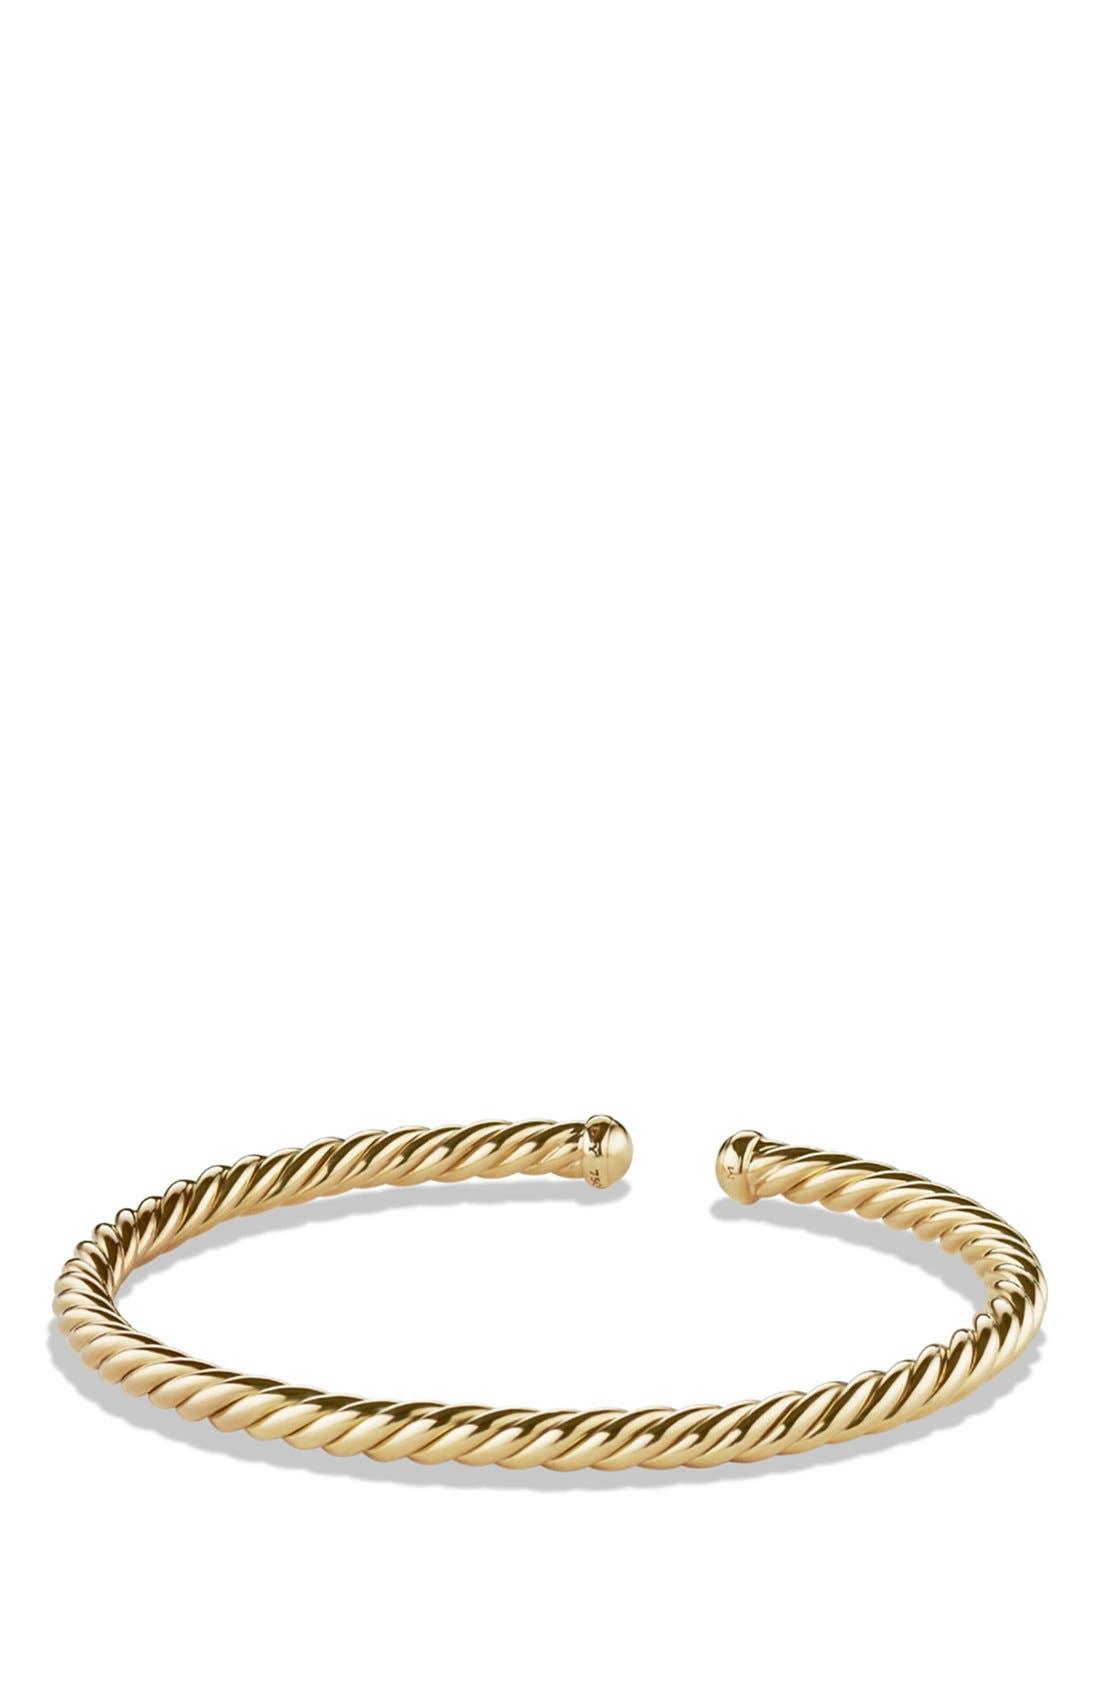 Cable Spira Bracelet in 18K Gold, 4mm,                             Main thumbnail 1, color,                             Gold